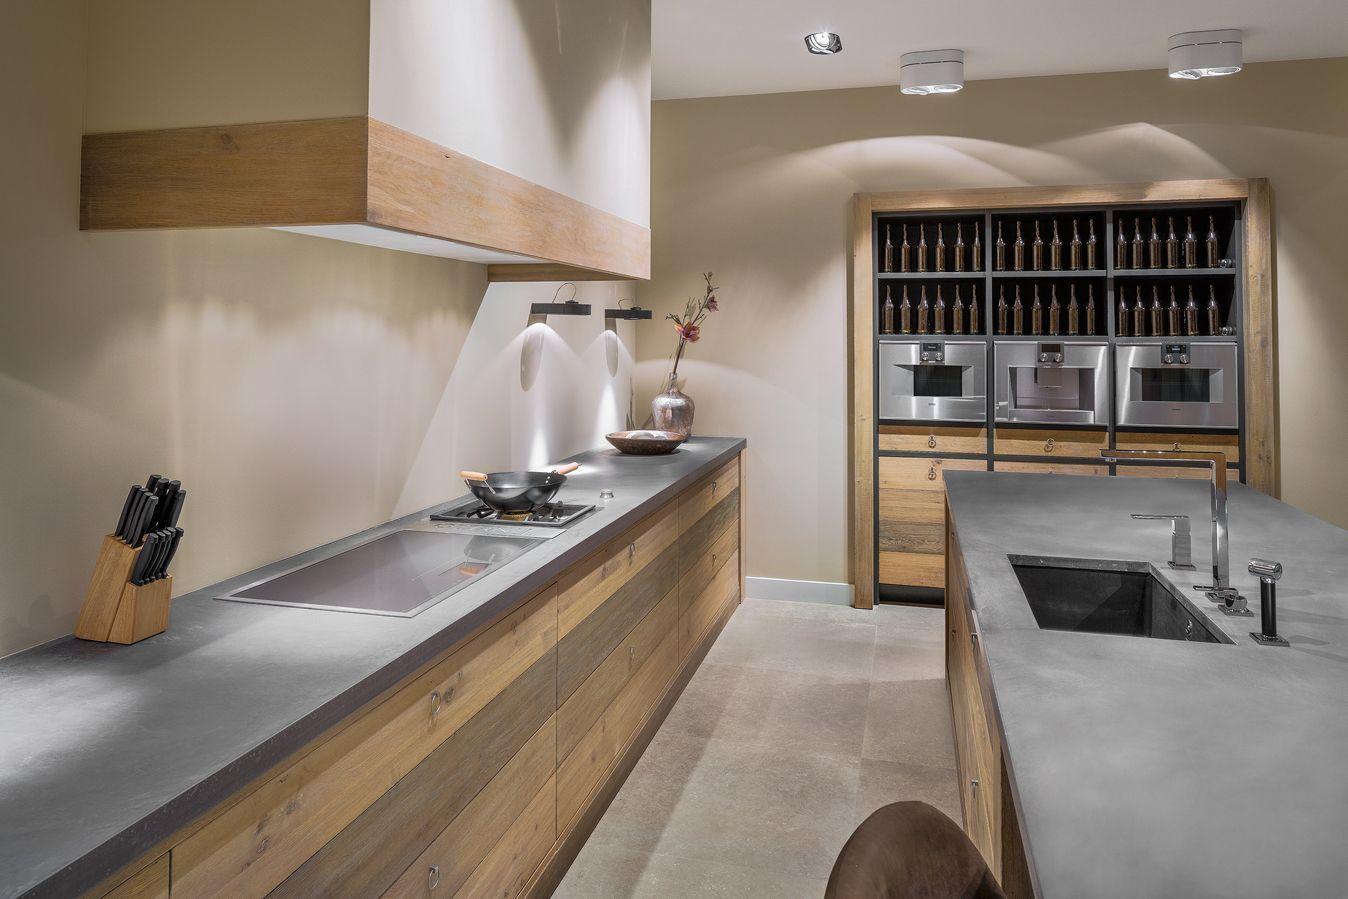 Moderne Keuken Met Betonnen Aanrecht Tinello Kitchens Cuisine Moderne Cuisines Design Meuble Cuisine